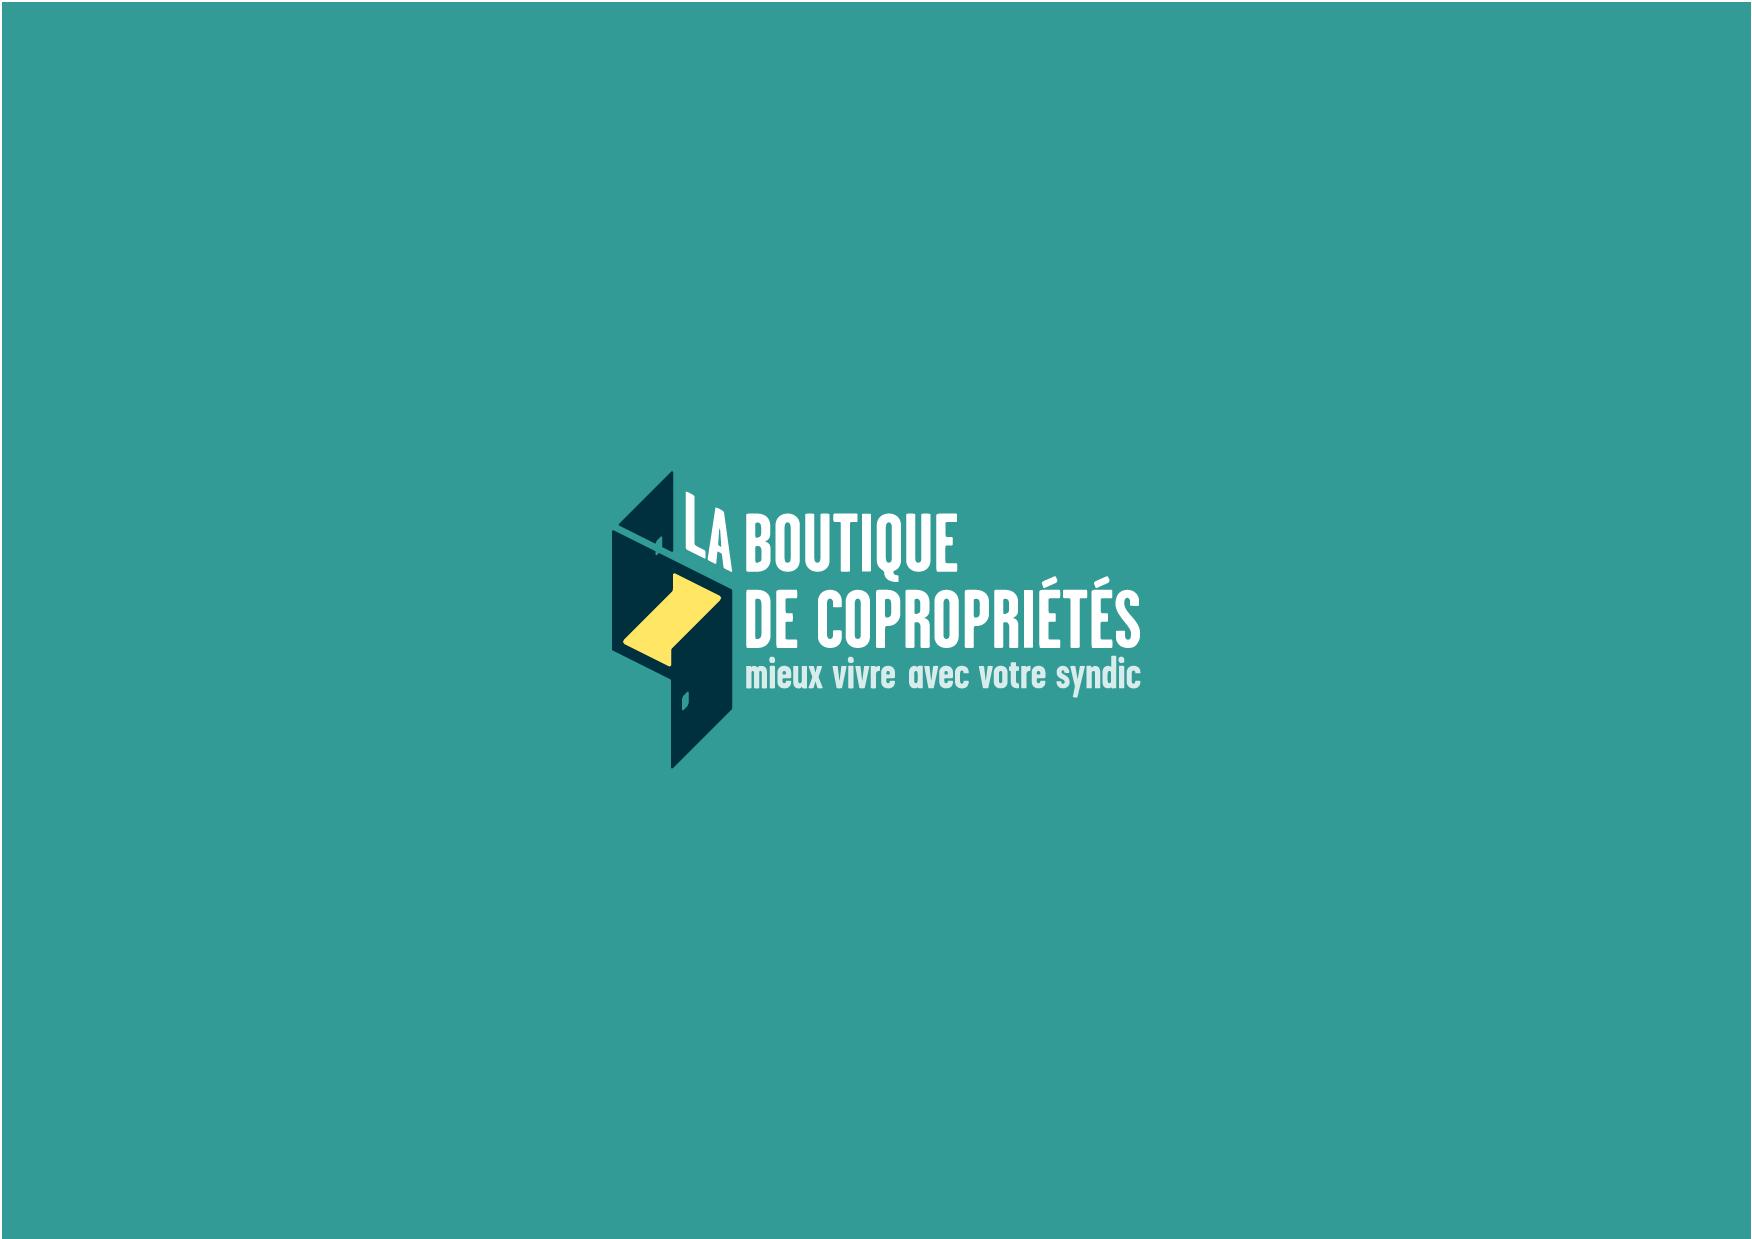 01-LBCOP_Mosaique-bleu_jaune+logo 420x297-pggg-ph.png